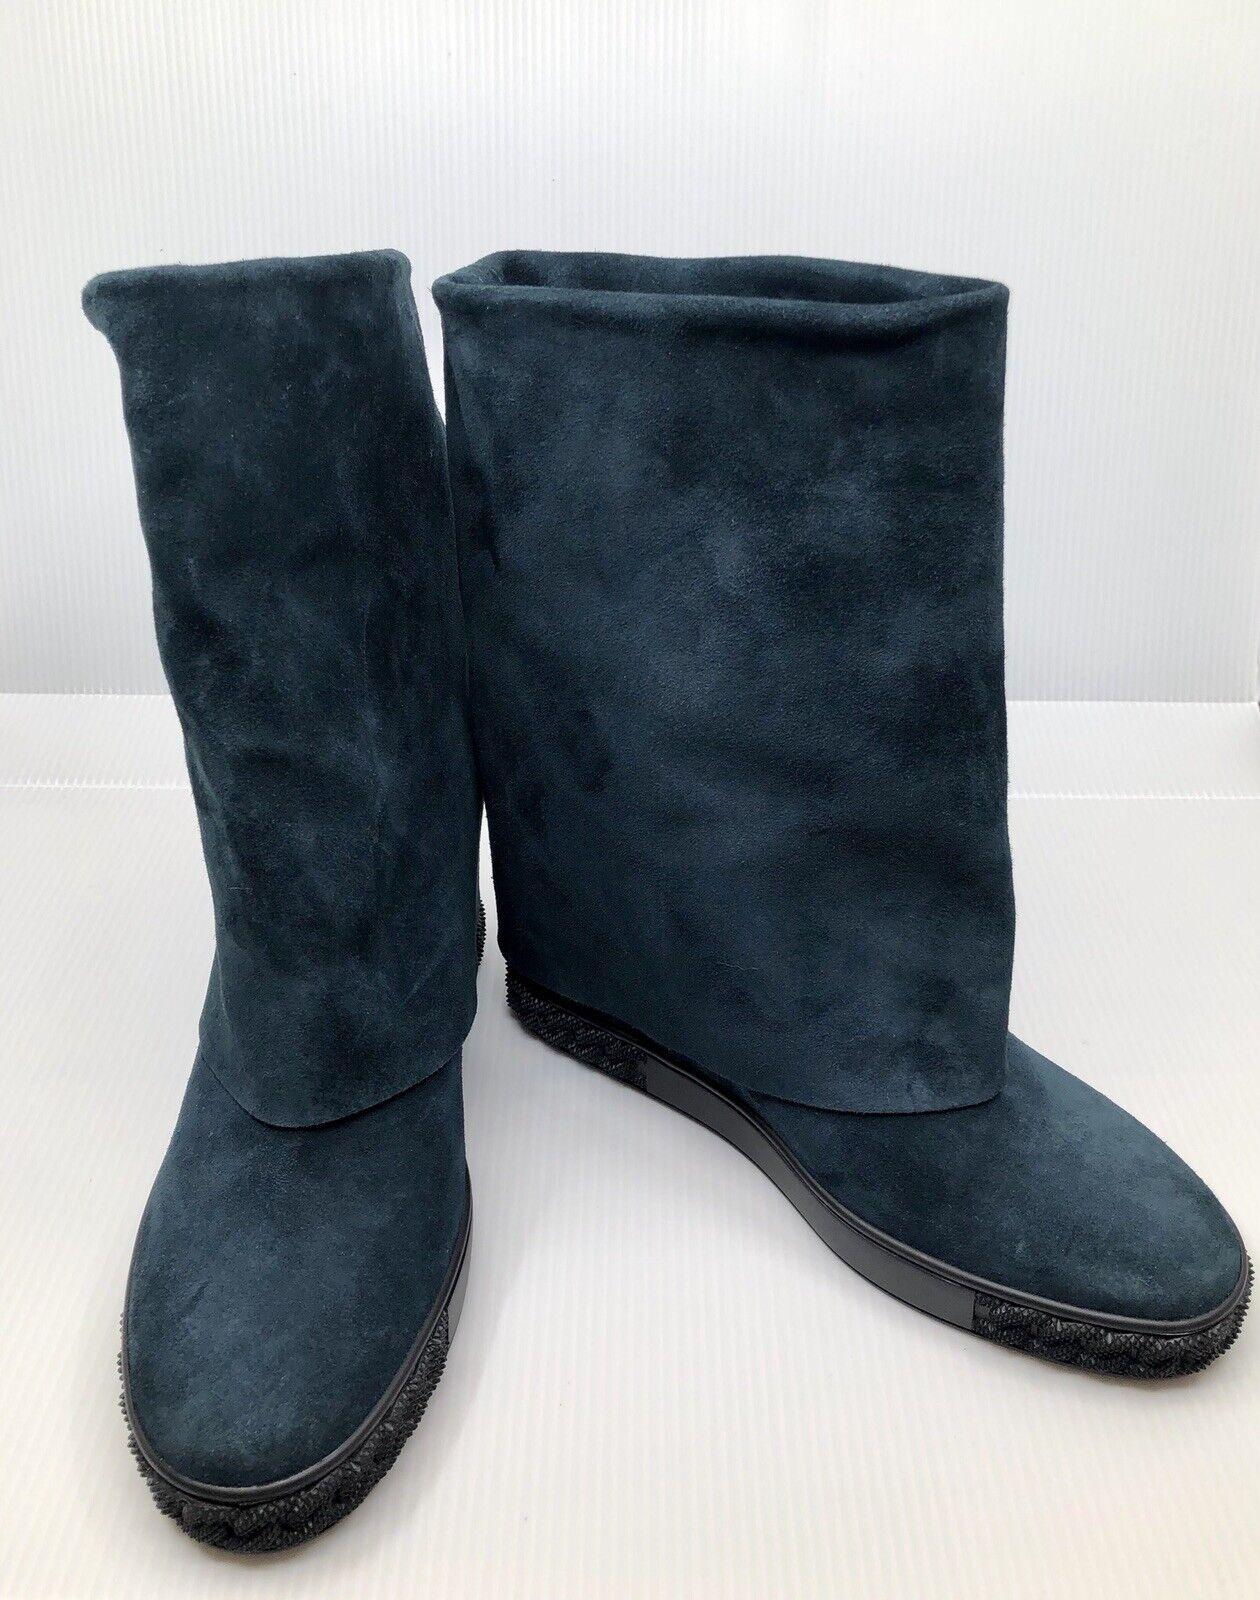 NEW Casadei Stivali women Green Fold Over Boots size UK 8